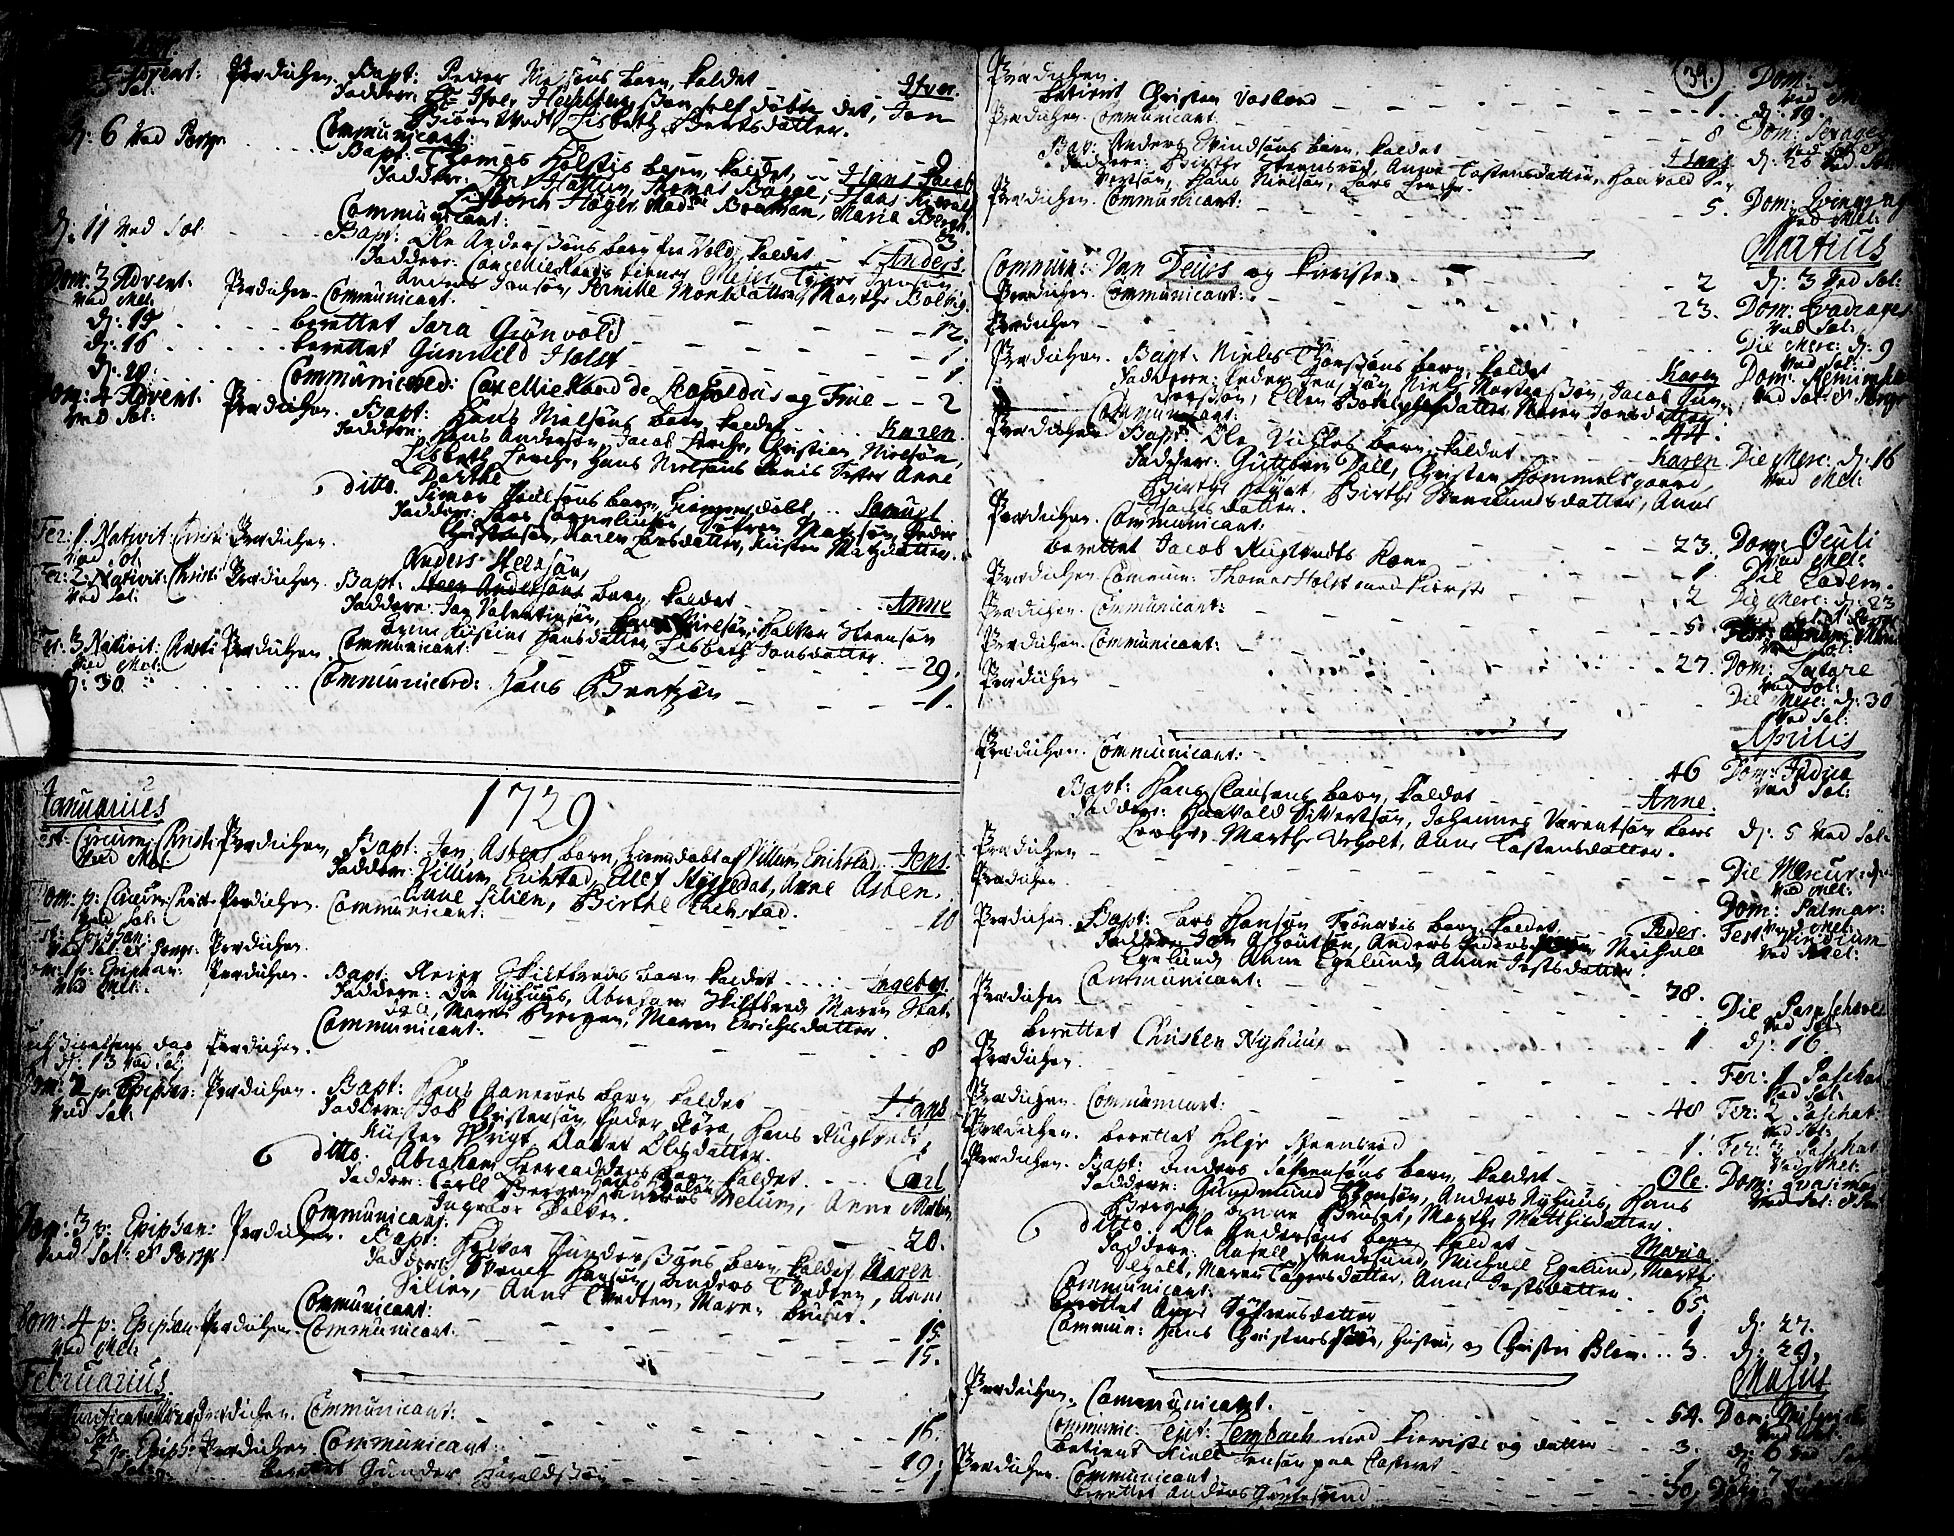 SAKO, Solum kirkebøker, F/Fa/L0002: Ministerialbok nr. I 2, 1713-1761, s. 39